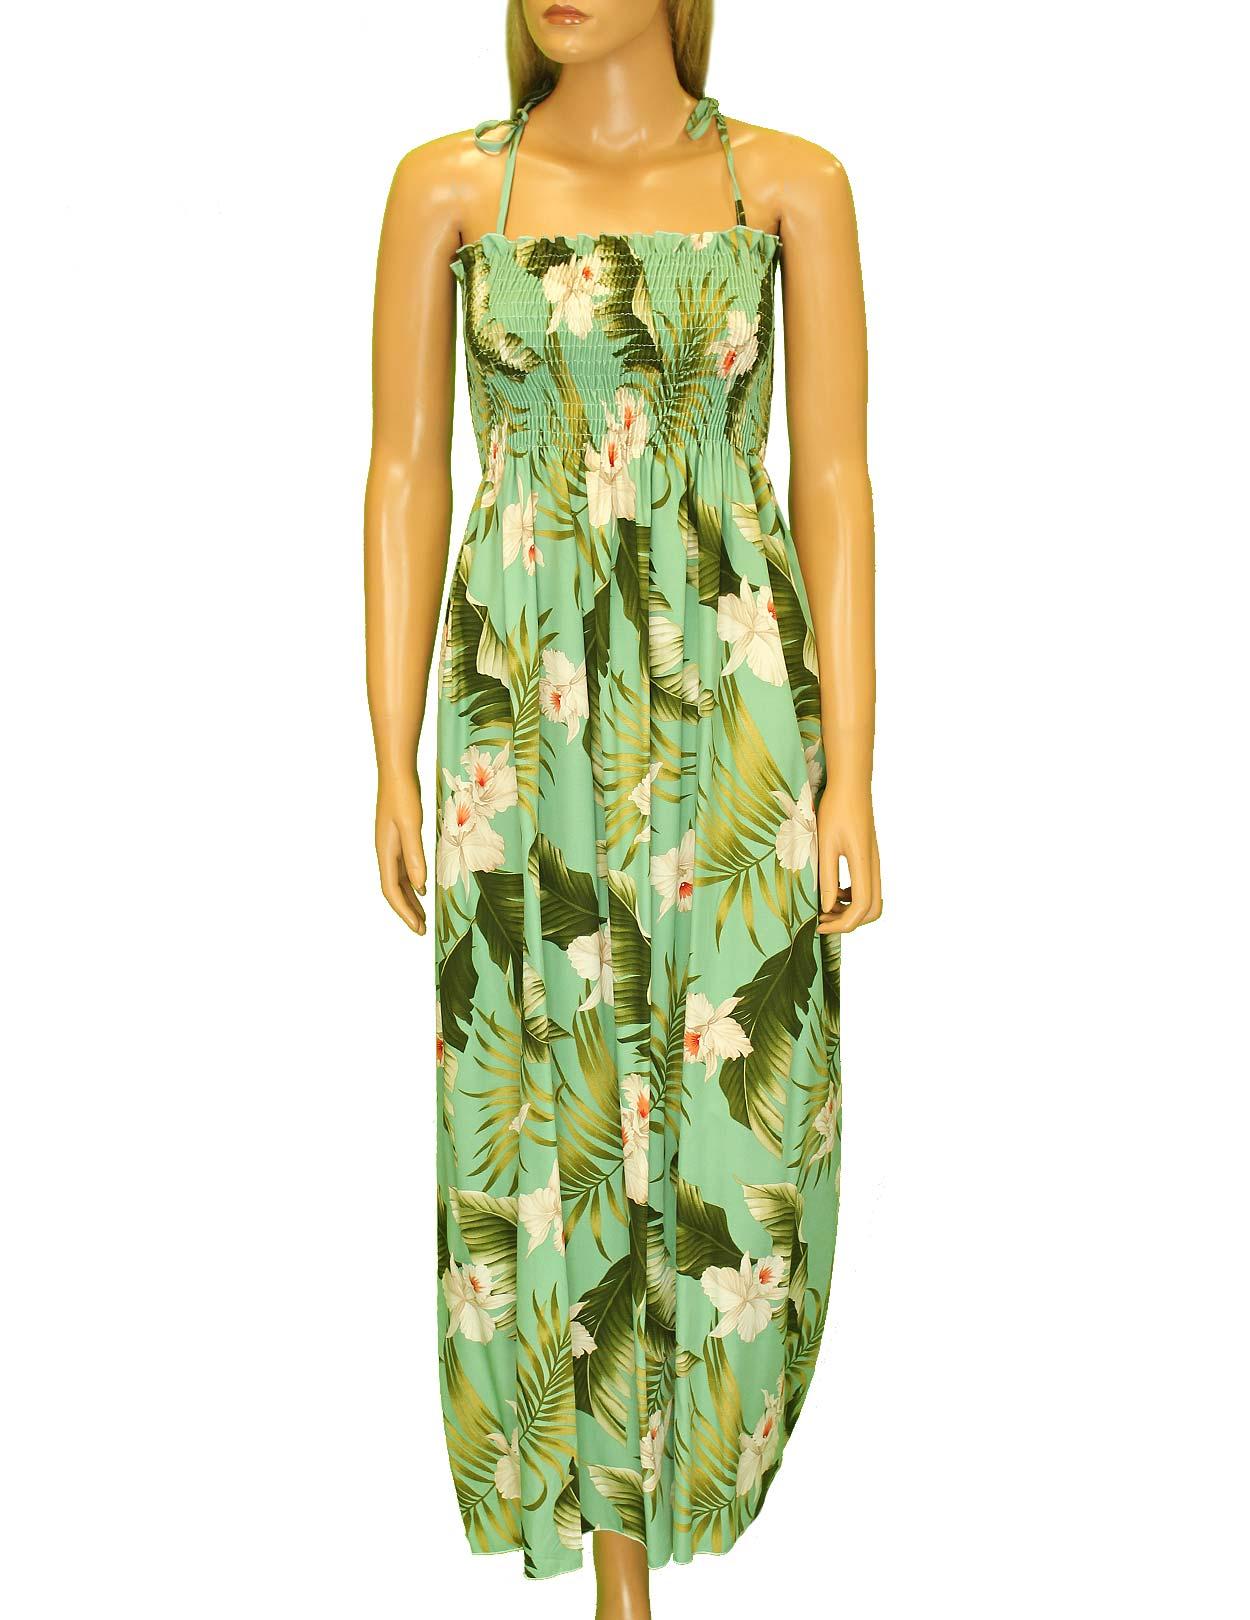 c3dfe1b54481 Hawaiian Dress Maxi Smock Top Orchids Creation: Shaka Time Hawaii Clothing  Store